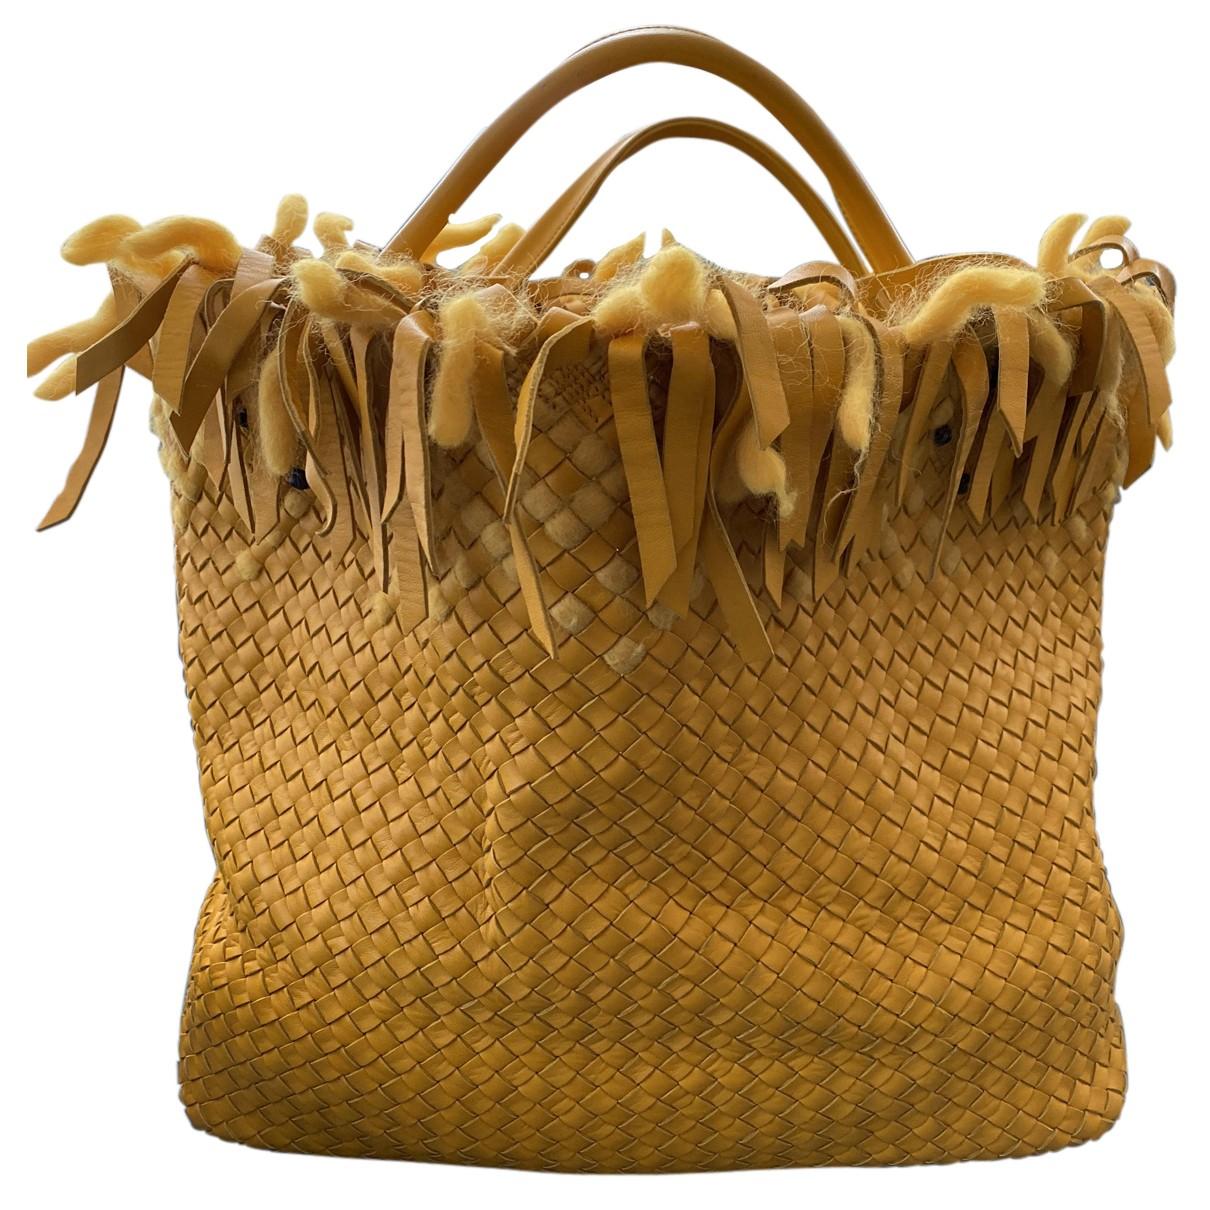 Bottega Veneta - Sac a main   pour femme en cuir - jaune